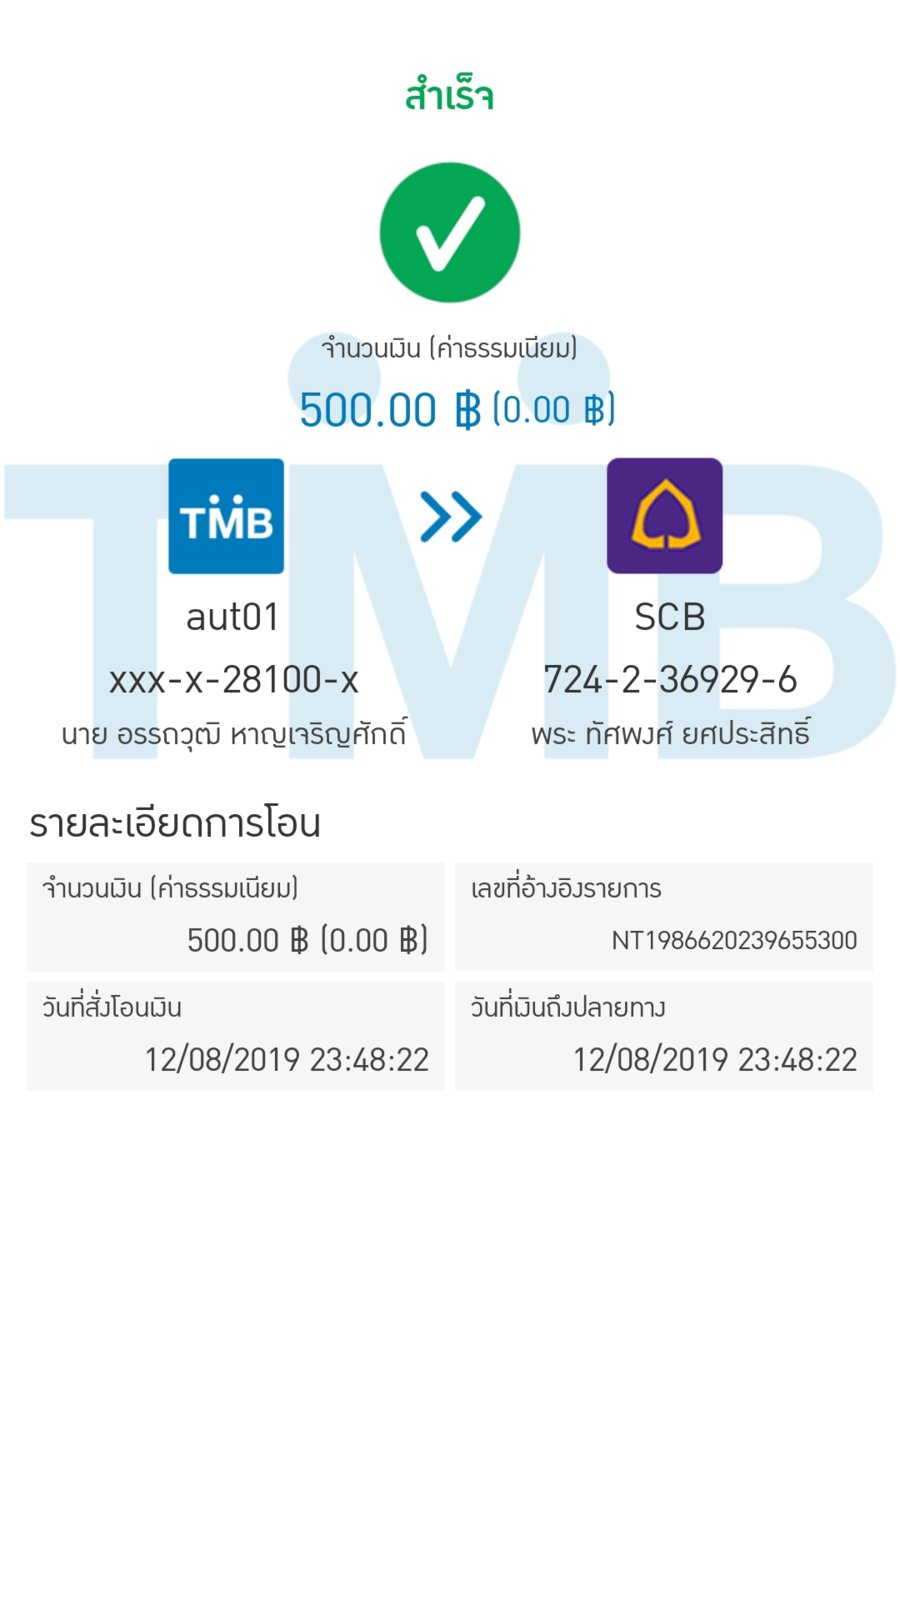 Transfer-12-8-2019 11-48-23.jpg